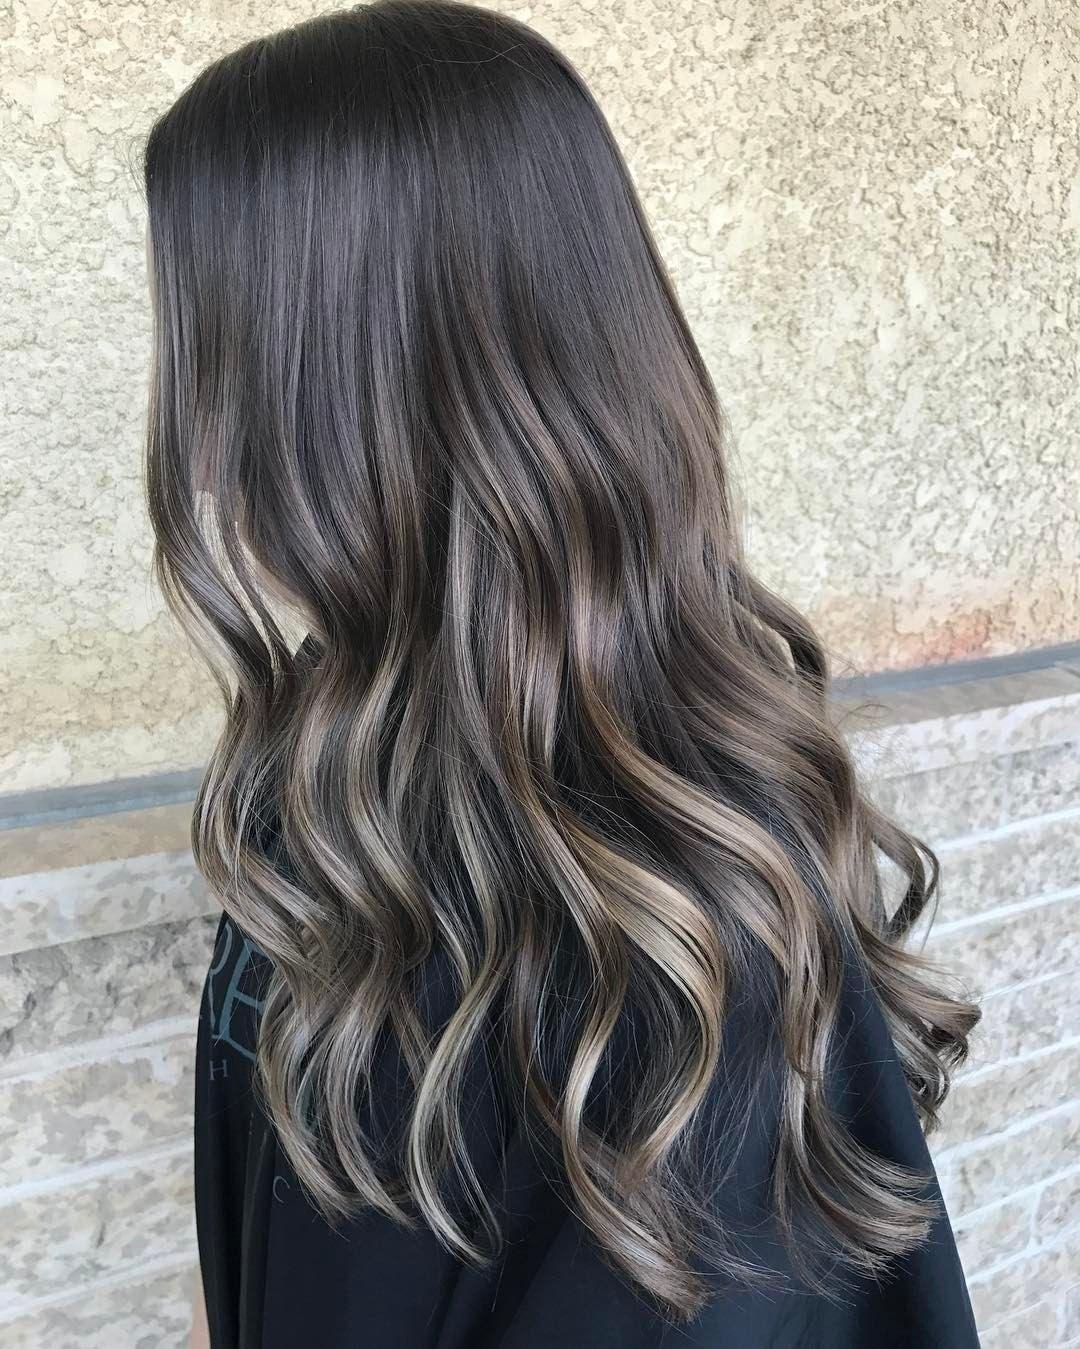 75 Likes 8 Comments Mallory Megan Vandenberg Mallorymeganhair On Instagram Iced Mocha Shoutout Brown Hair Balayage Balayage Hair Hair Styles